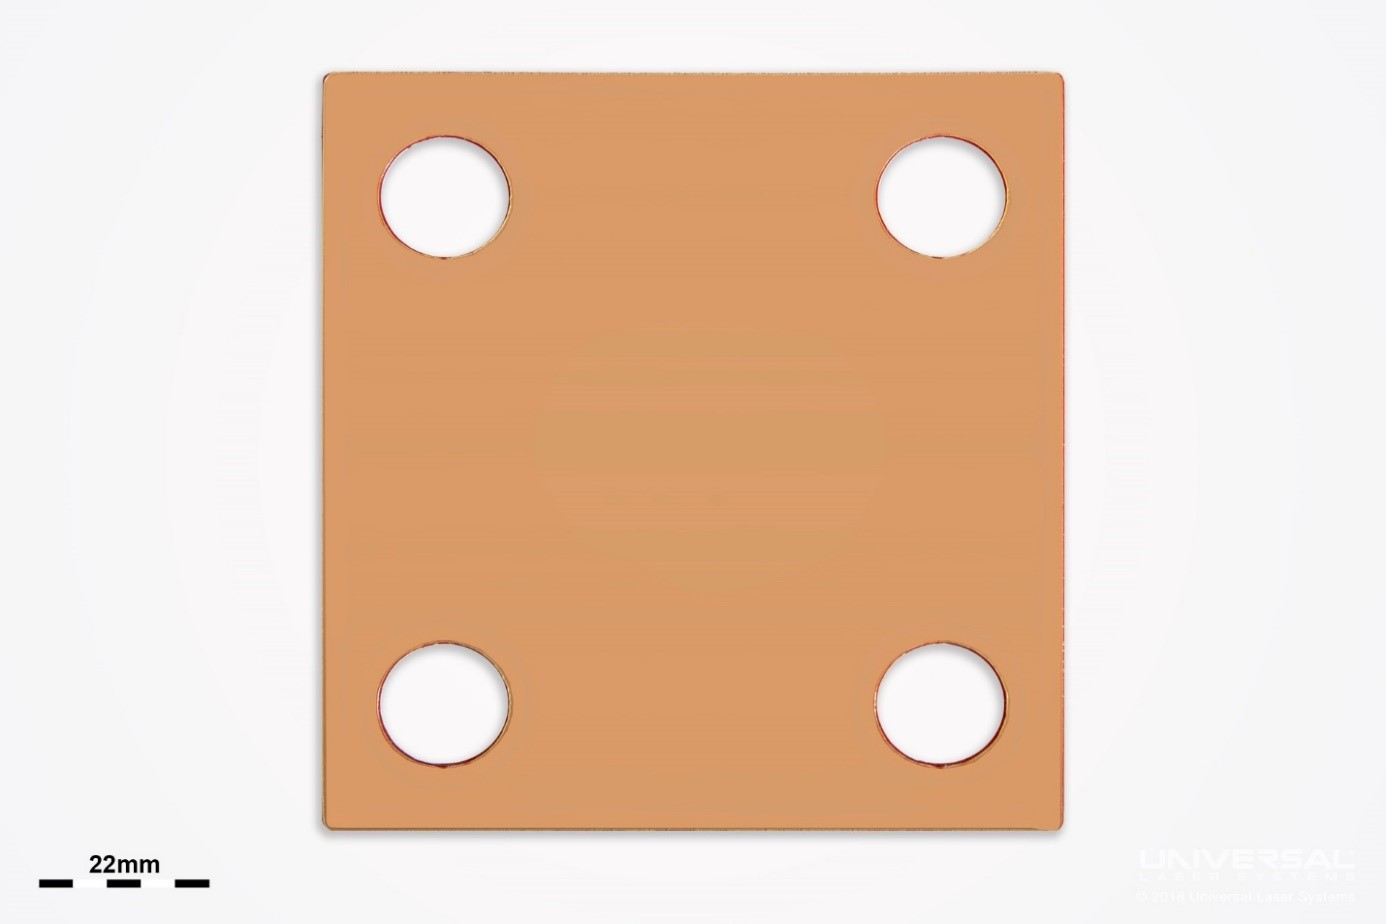 3M Scotch-Weld Structural Adhesive Film AF 163-2 Figure 5